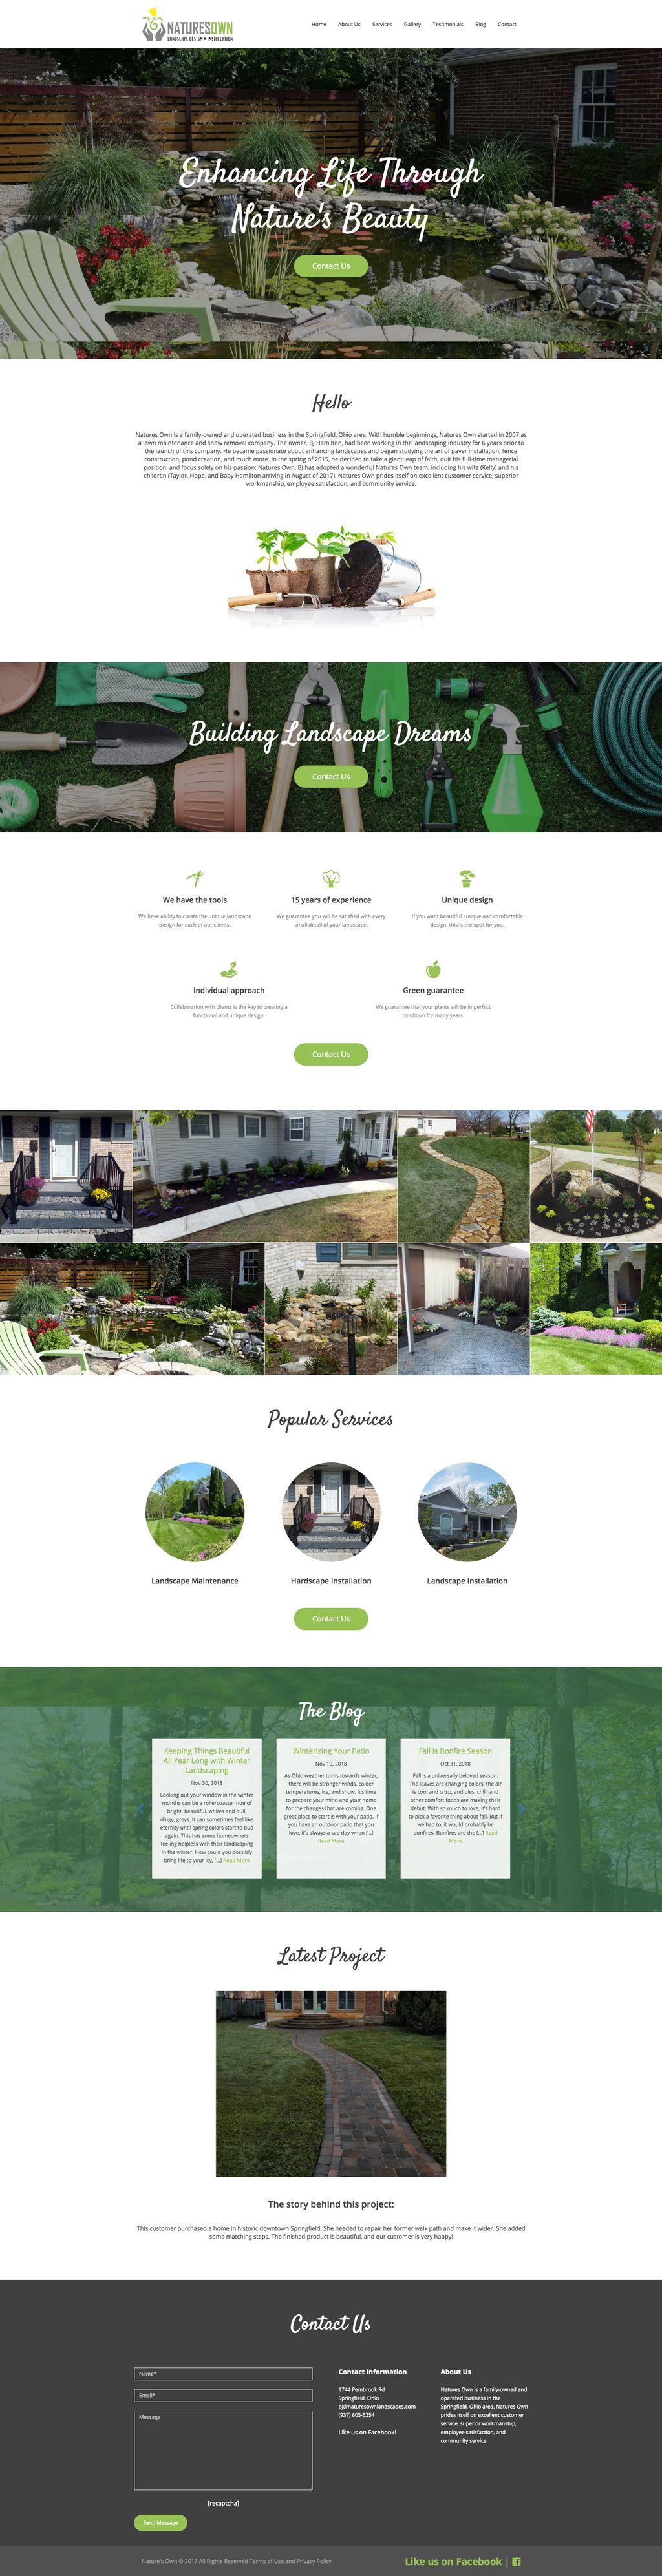 Landscaping Business Website Redesign